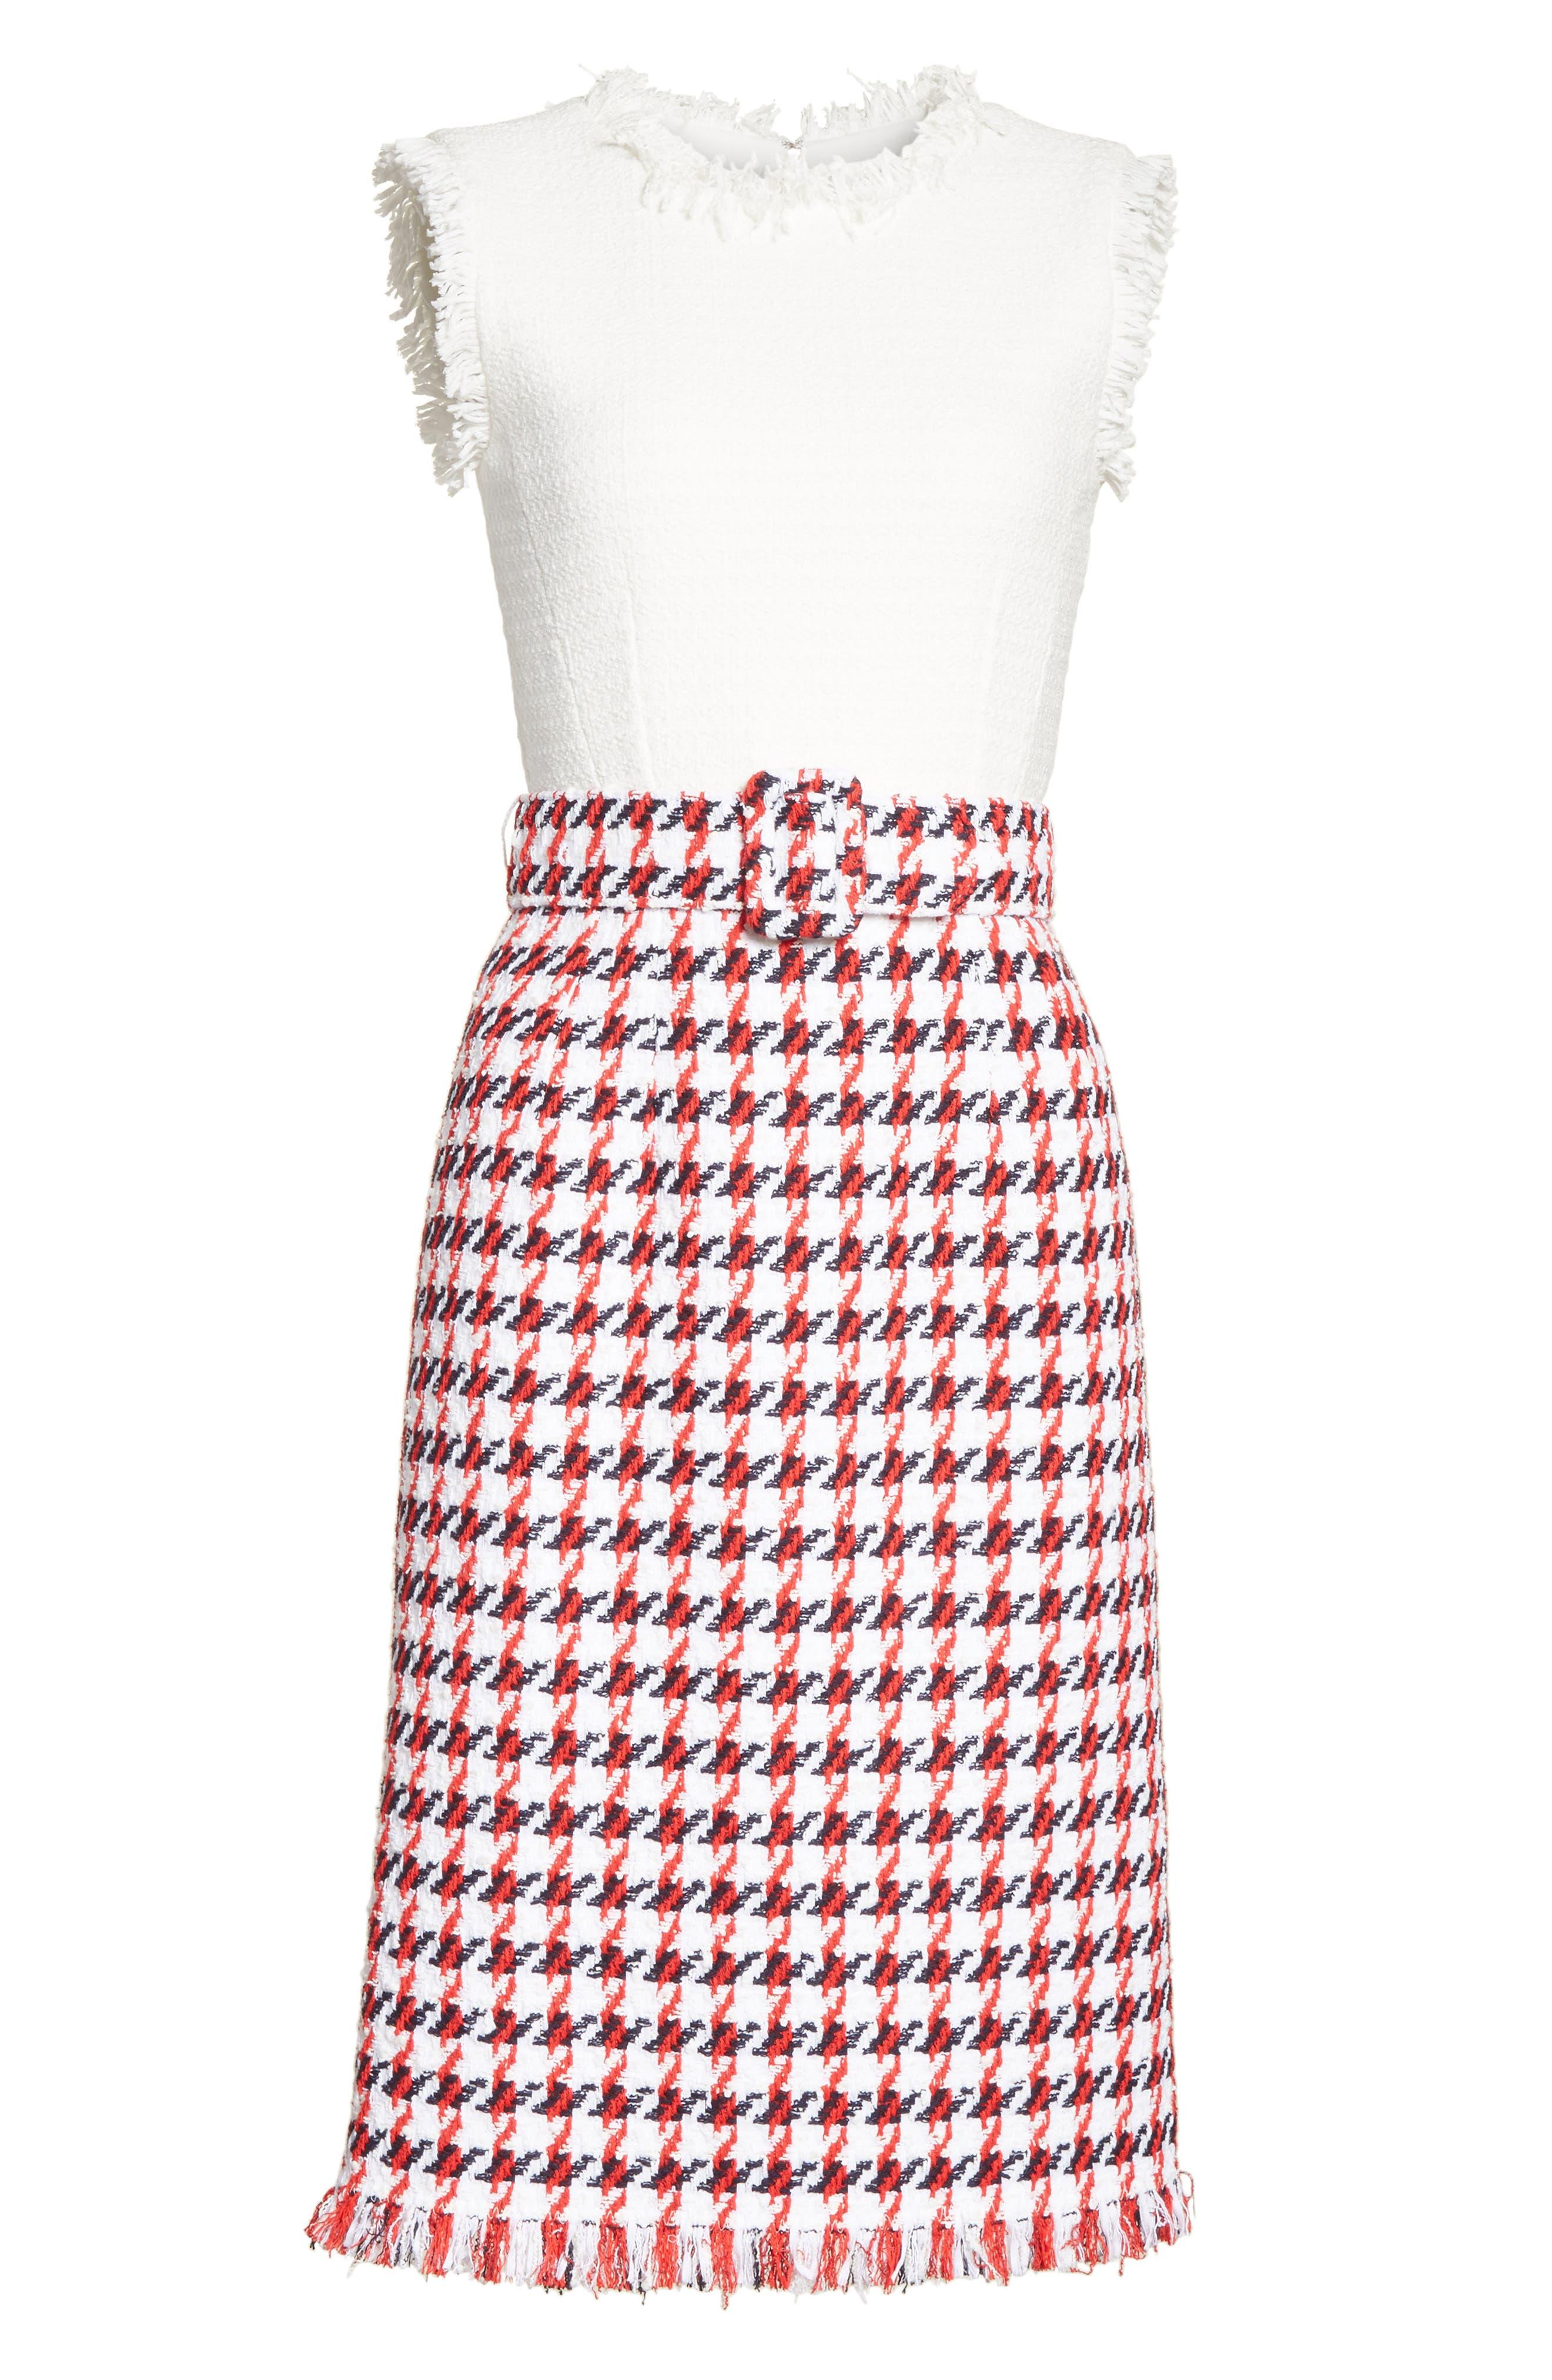 Bicolor Houndstooth Tweed Dress,                             Alternate thumbnail 6, color,                             900